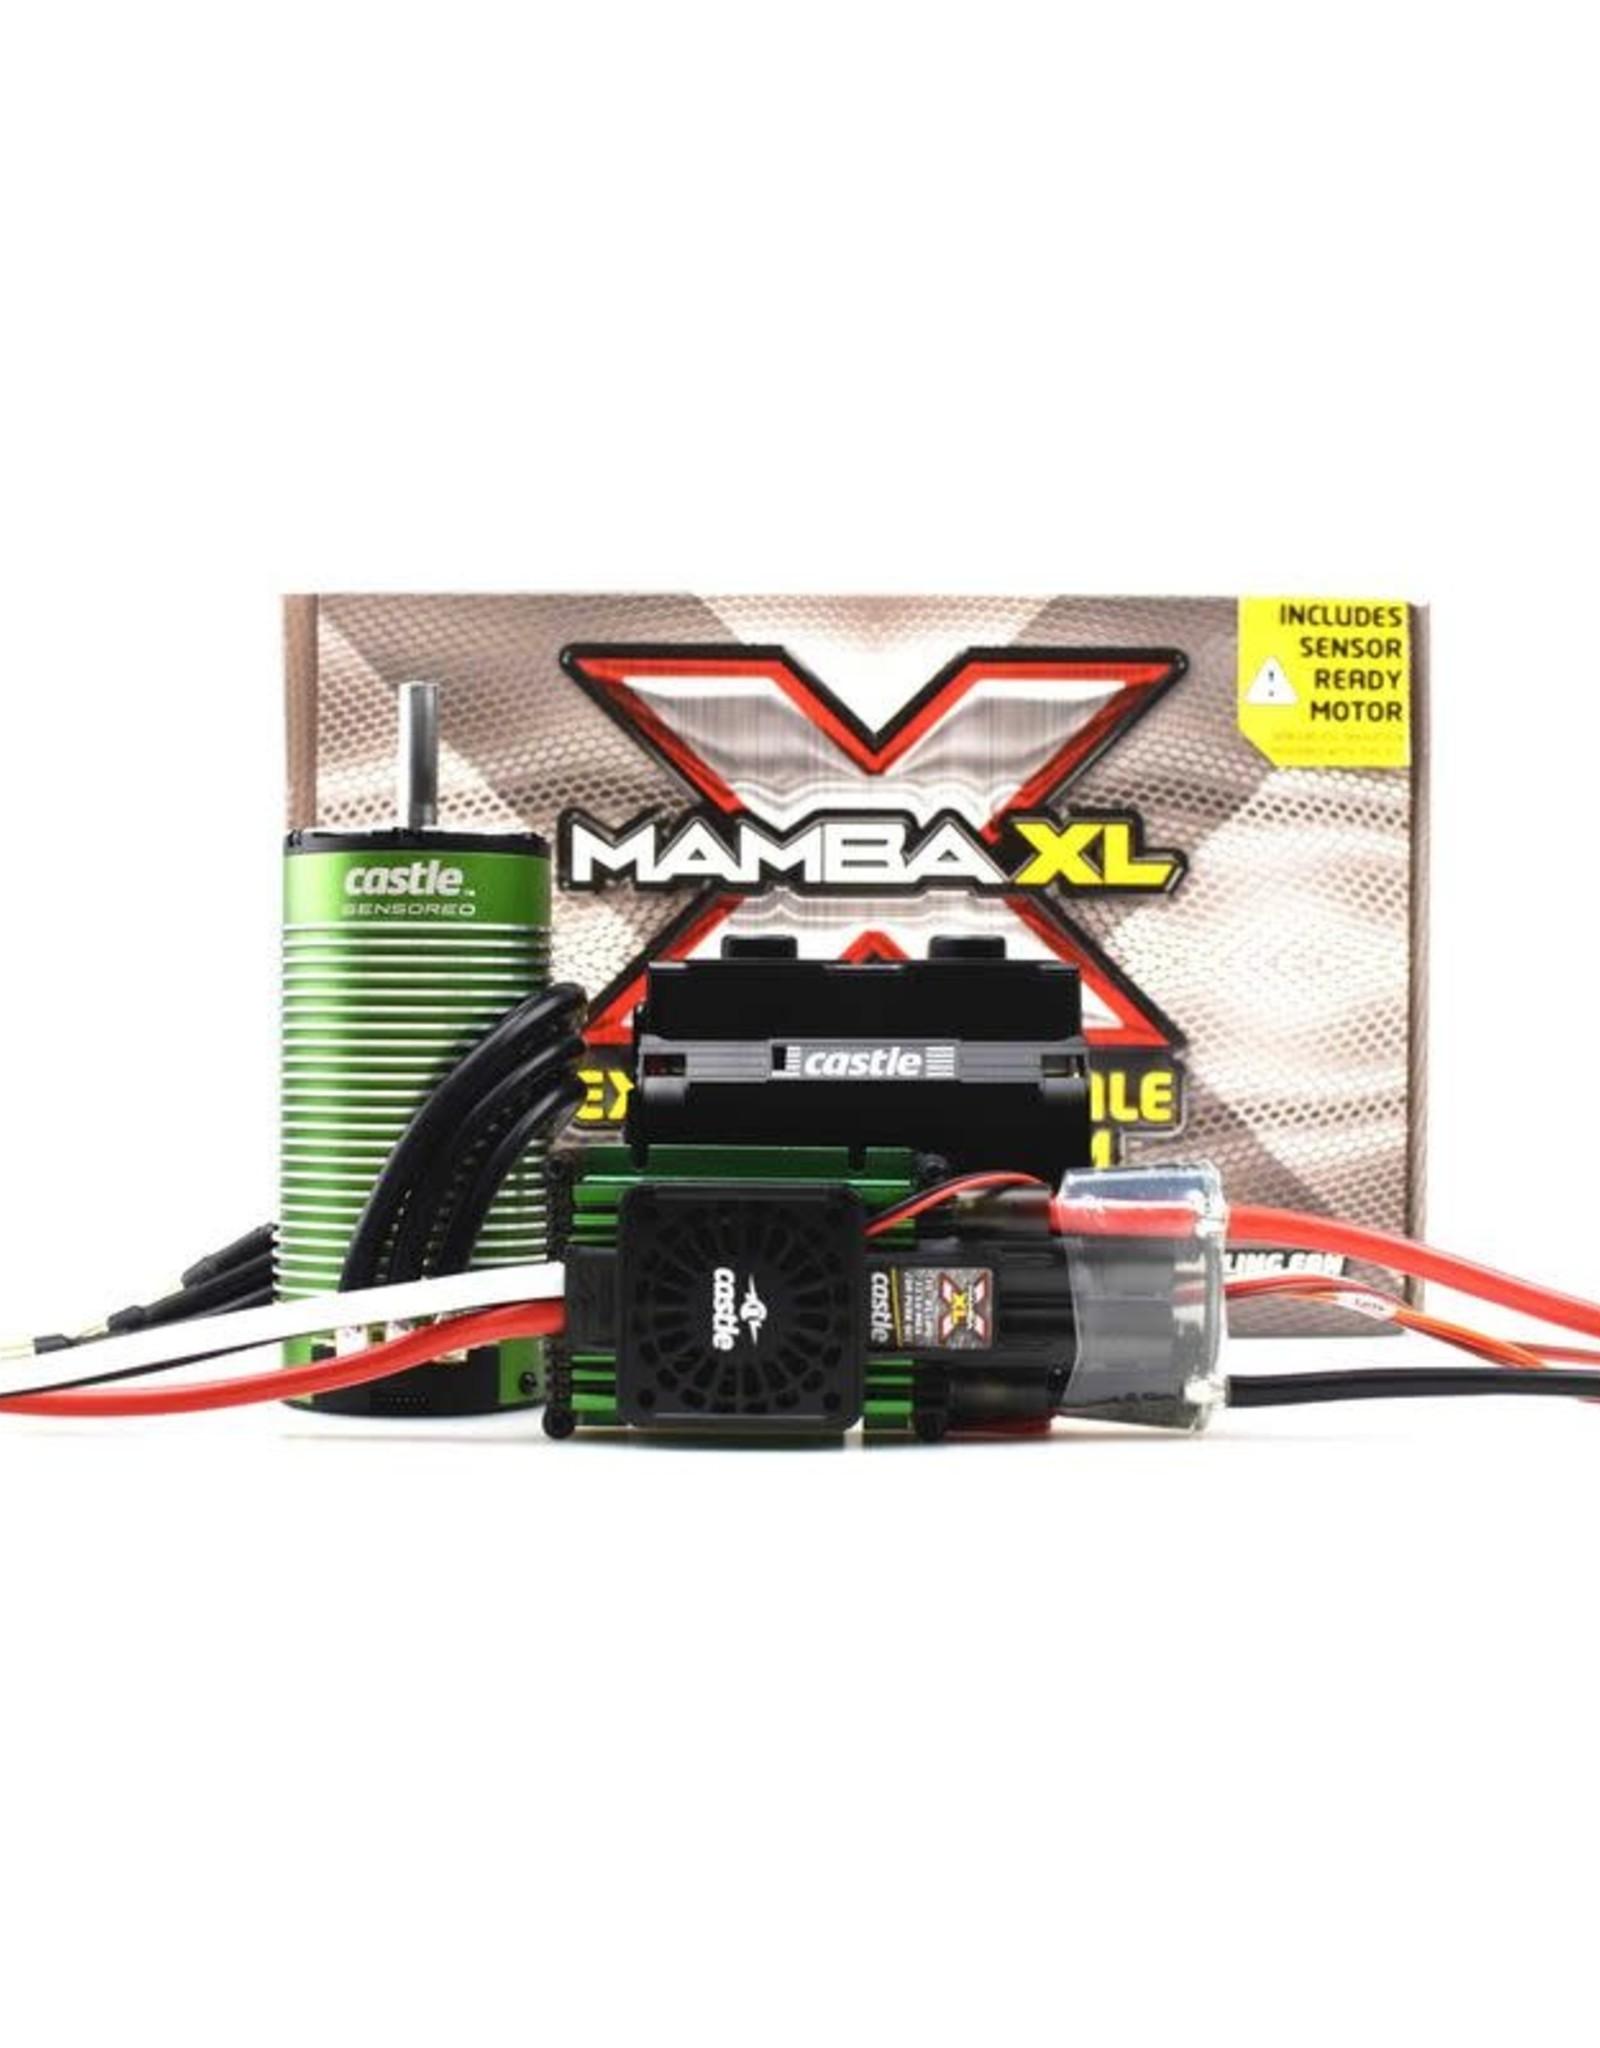 CSE CSE010014201 1/5 MAMBA XLX 34V,20AMP Peak BEC,2028-800KV Motor